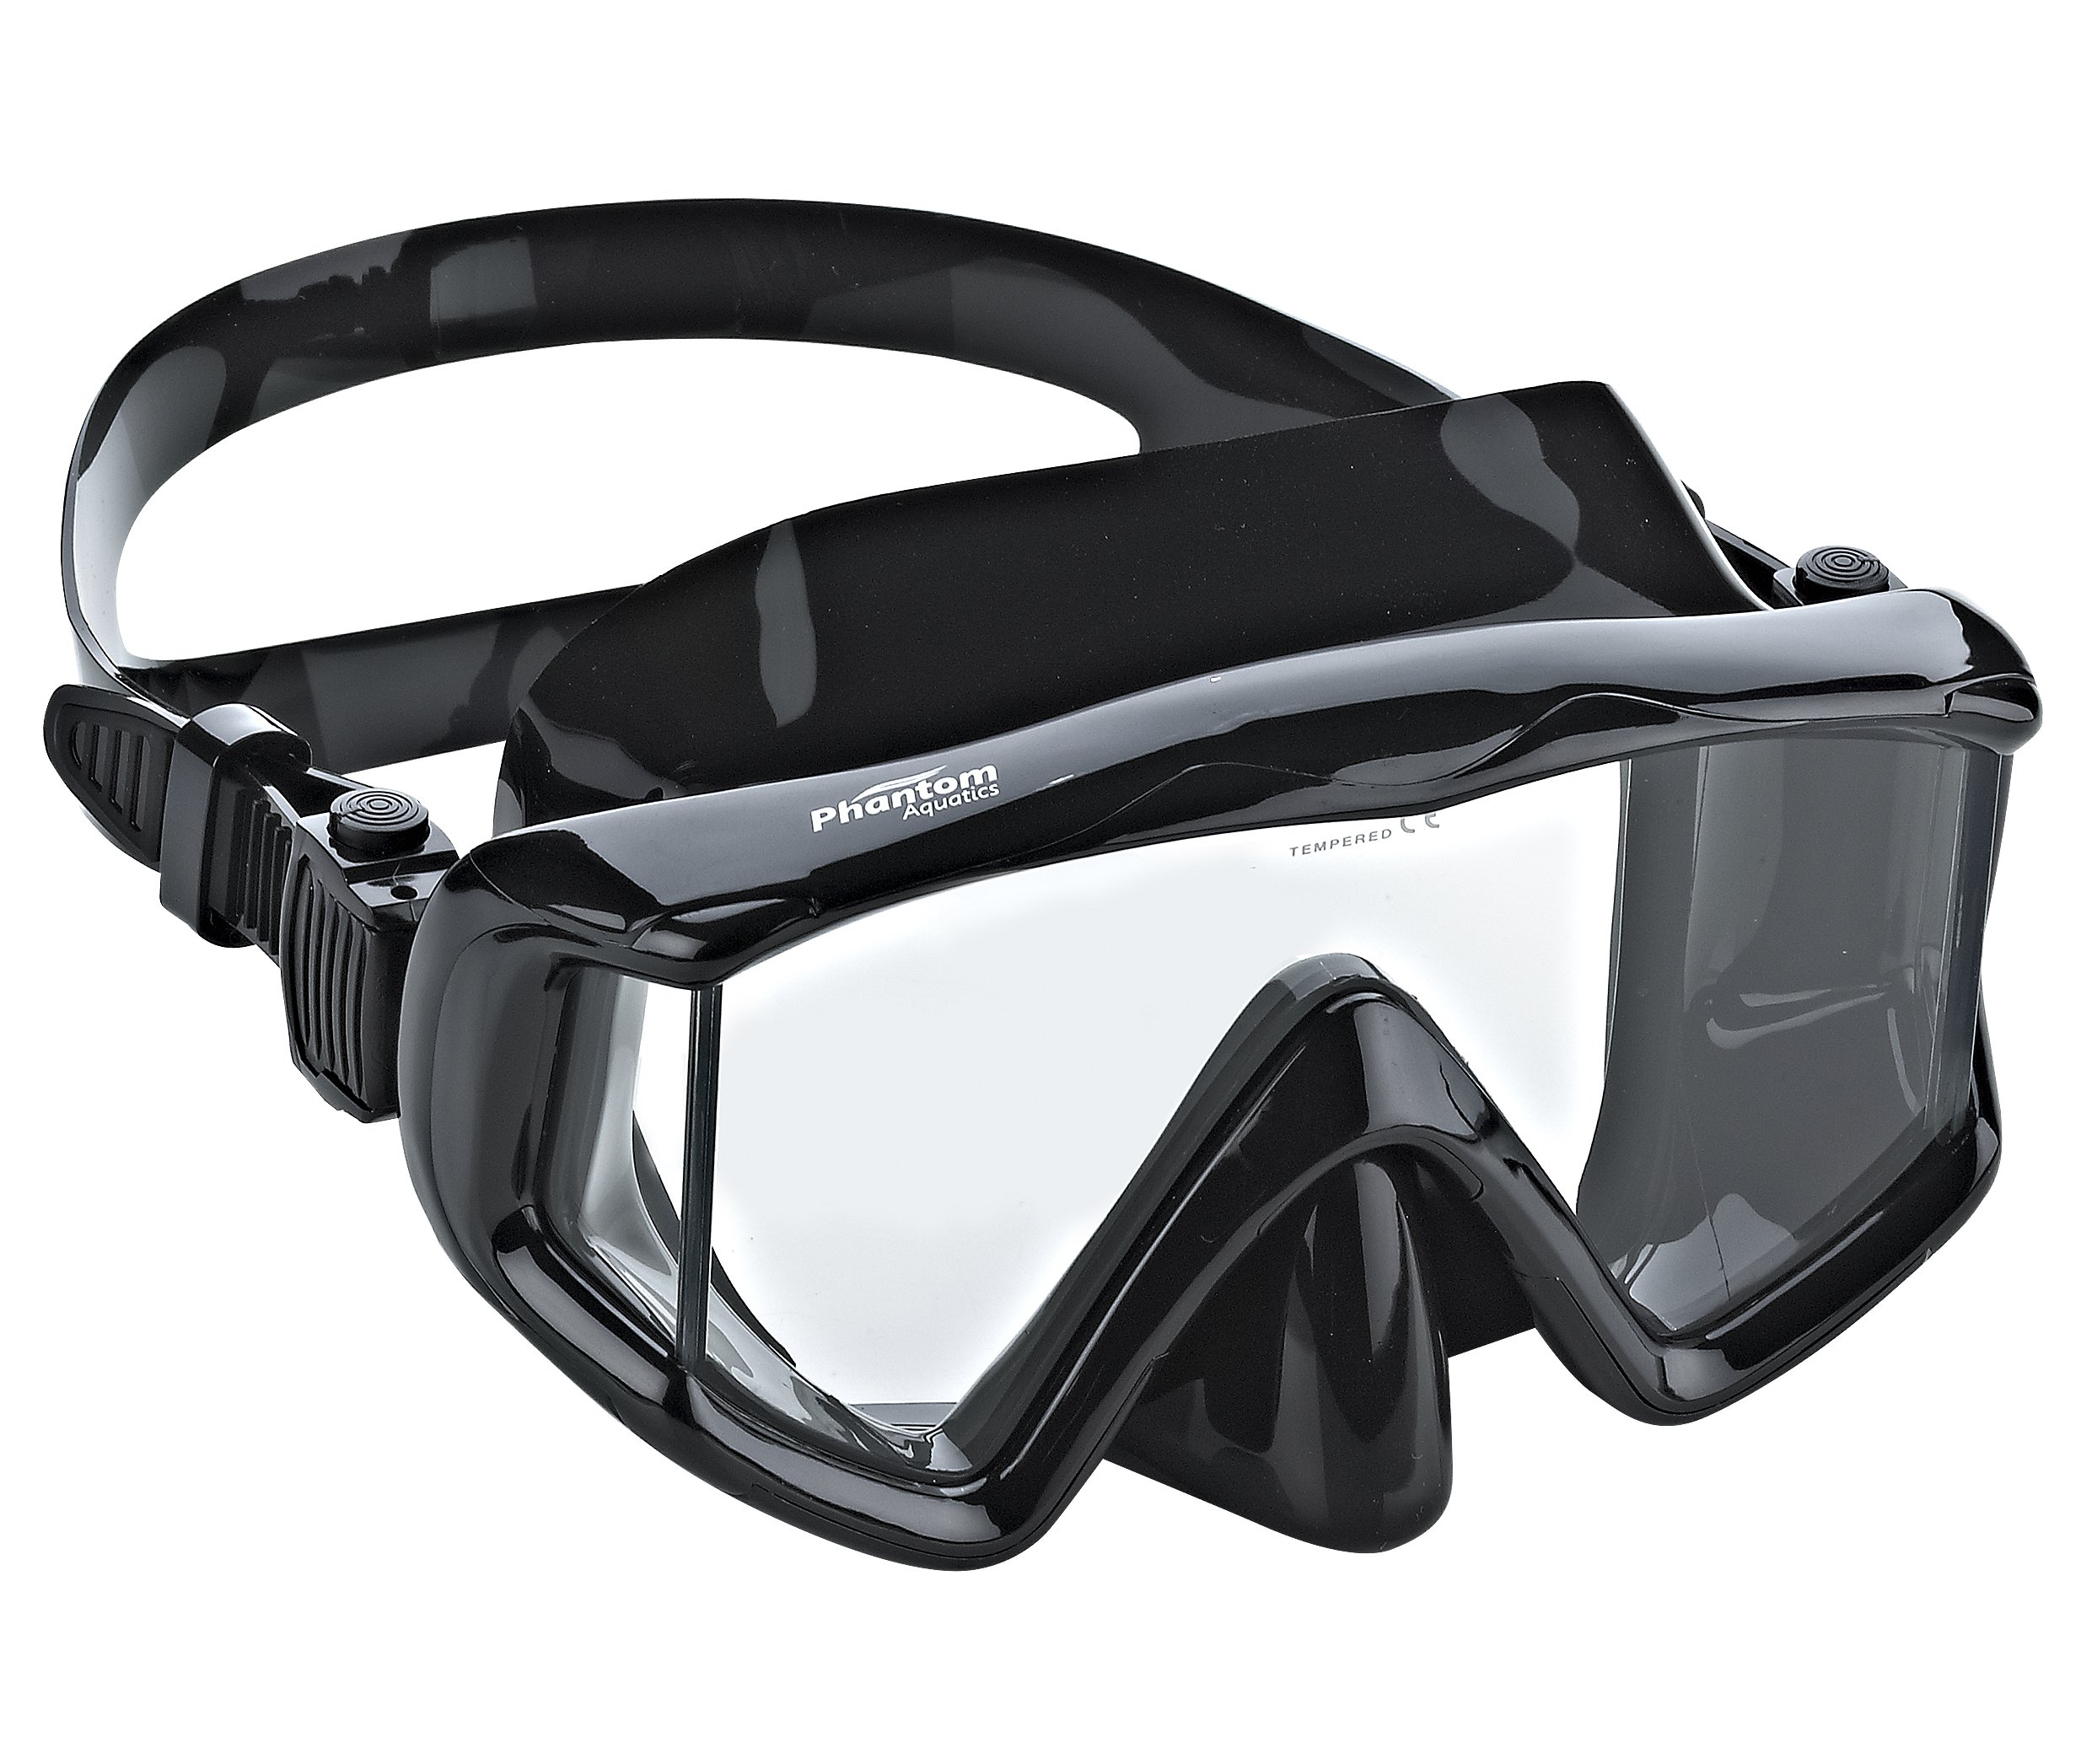 Phantom Aquatics Panoramic Scuba Snorkeling Dive Mask, All Black by Phantom Aquatics